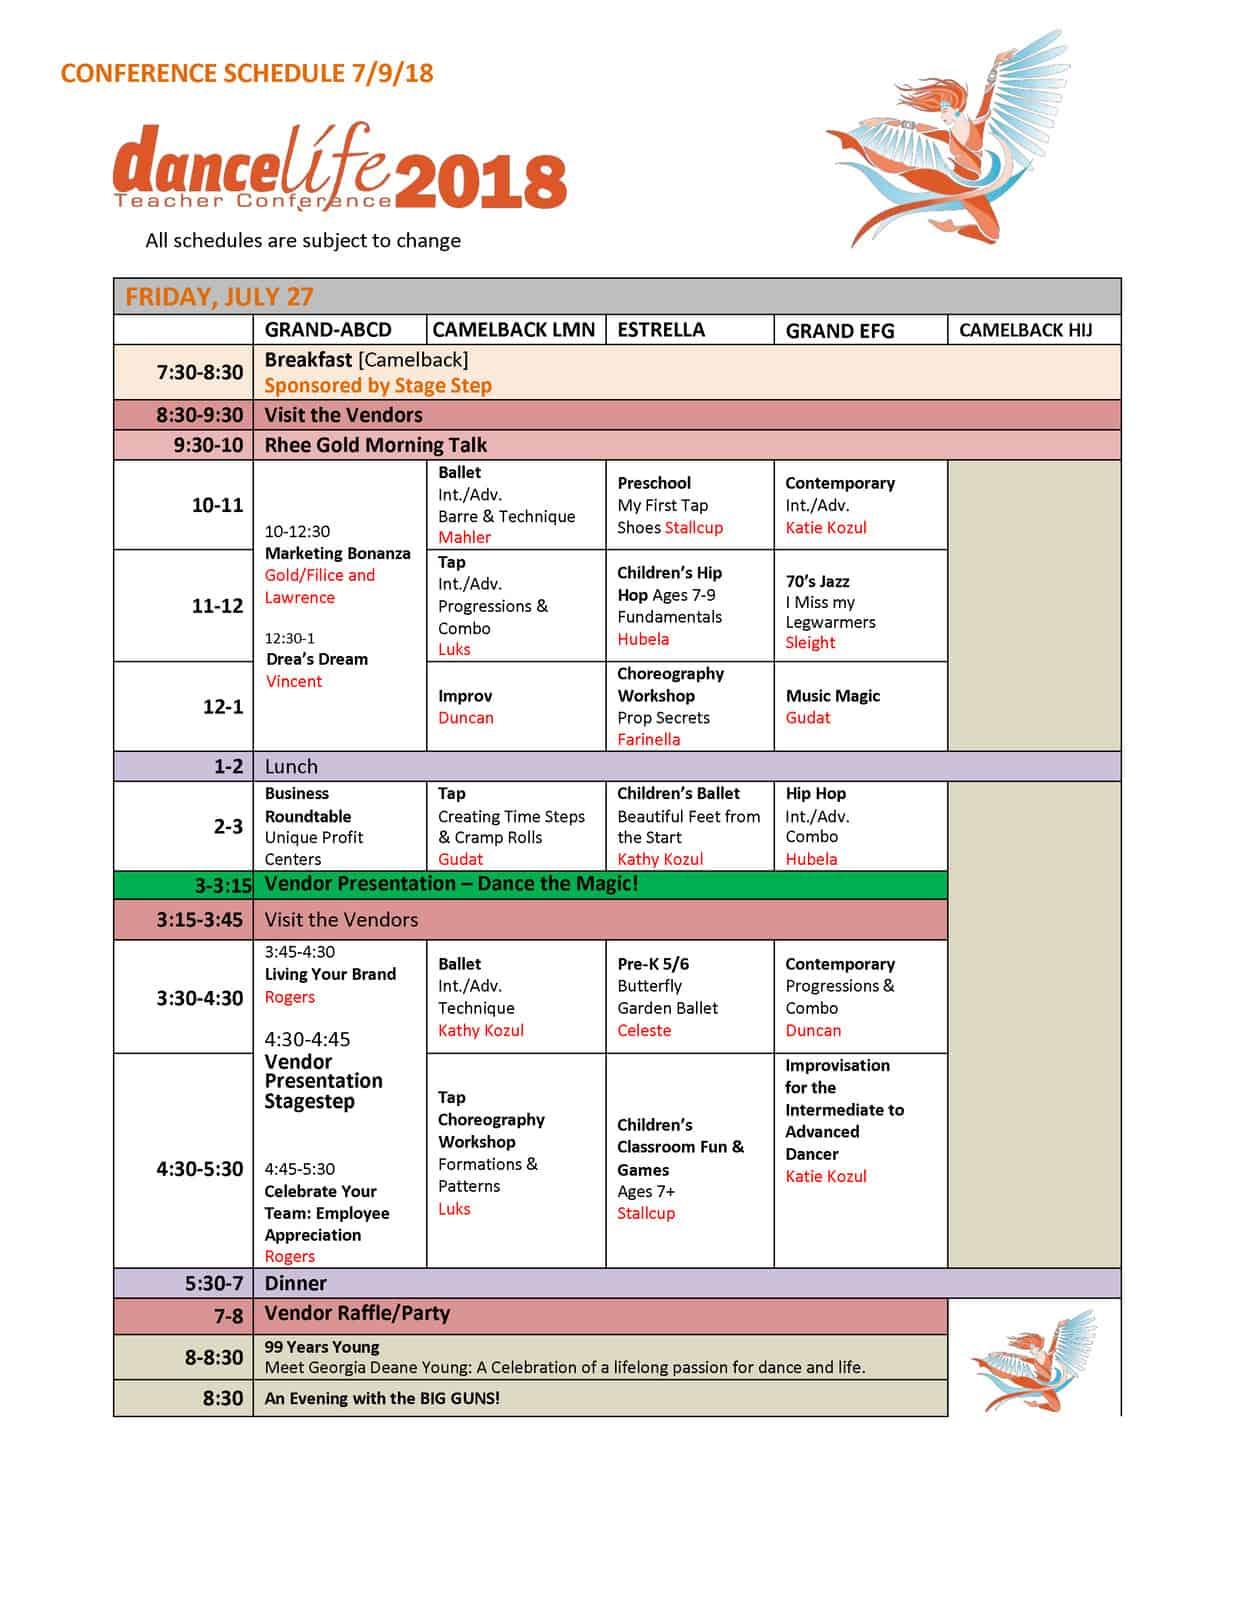 DLTC Schedule 2018_Page_1